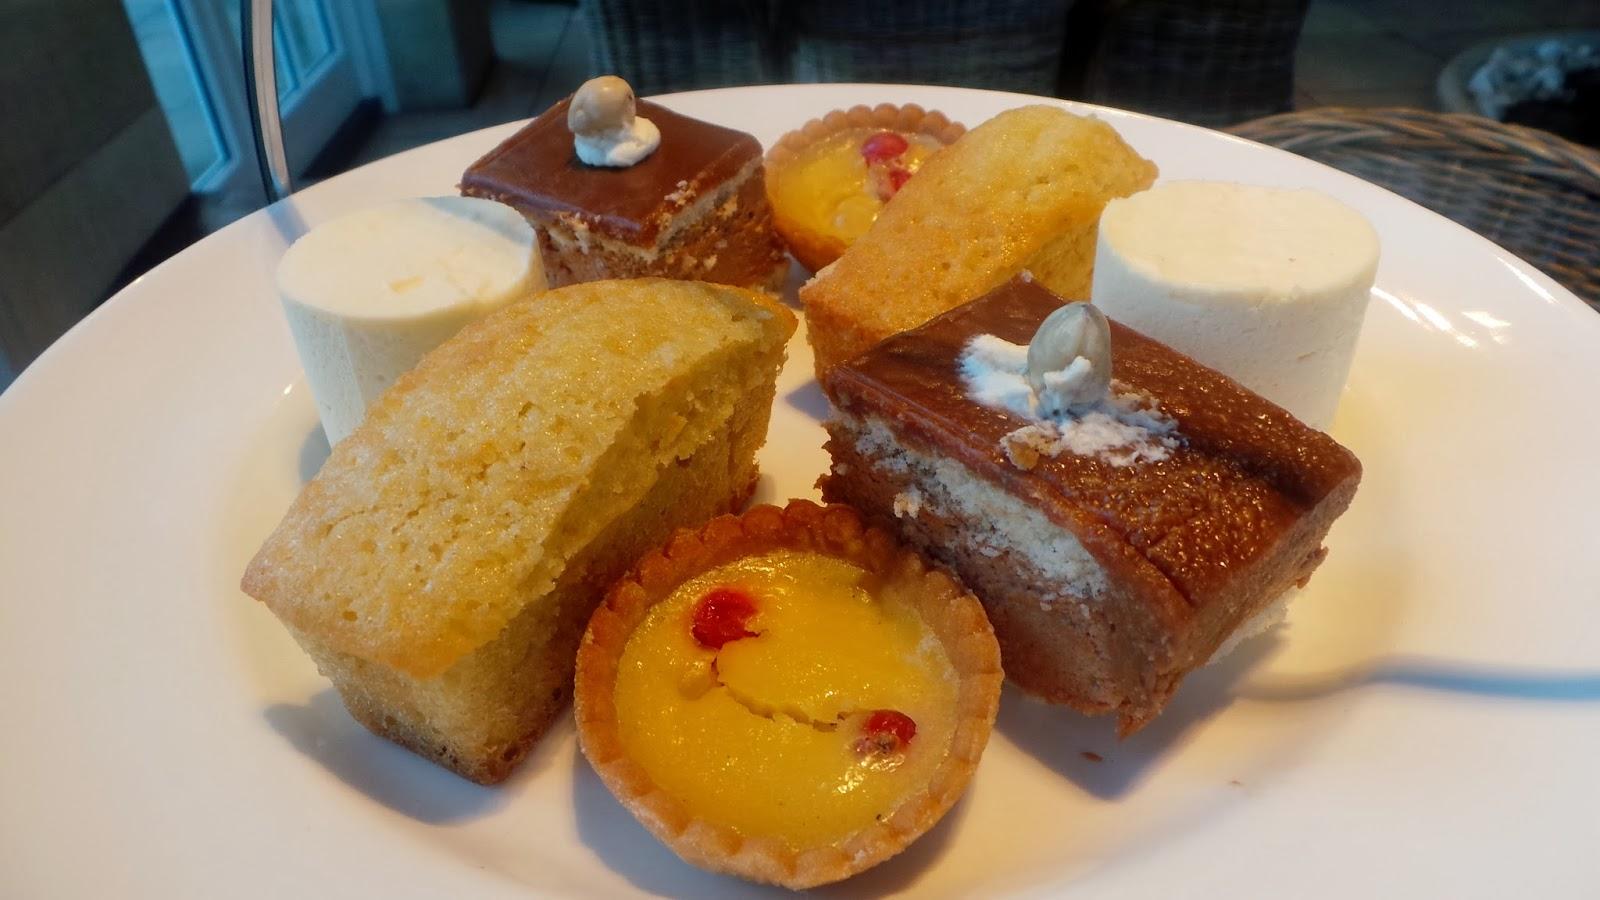 Harrogate cakes